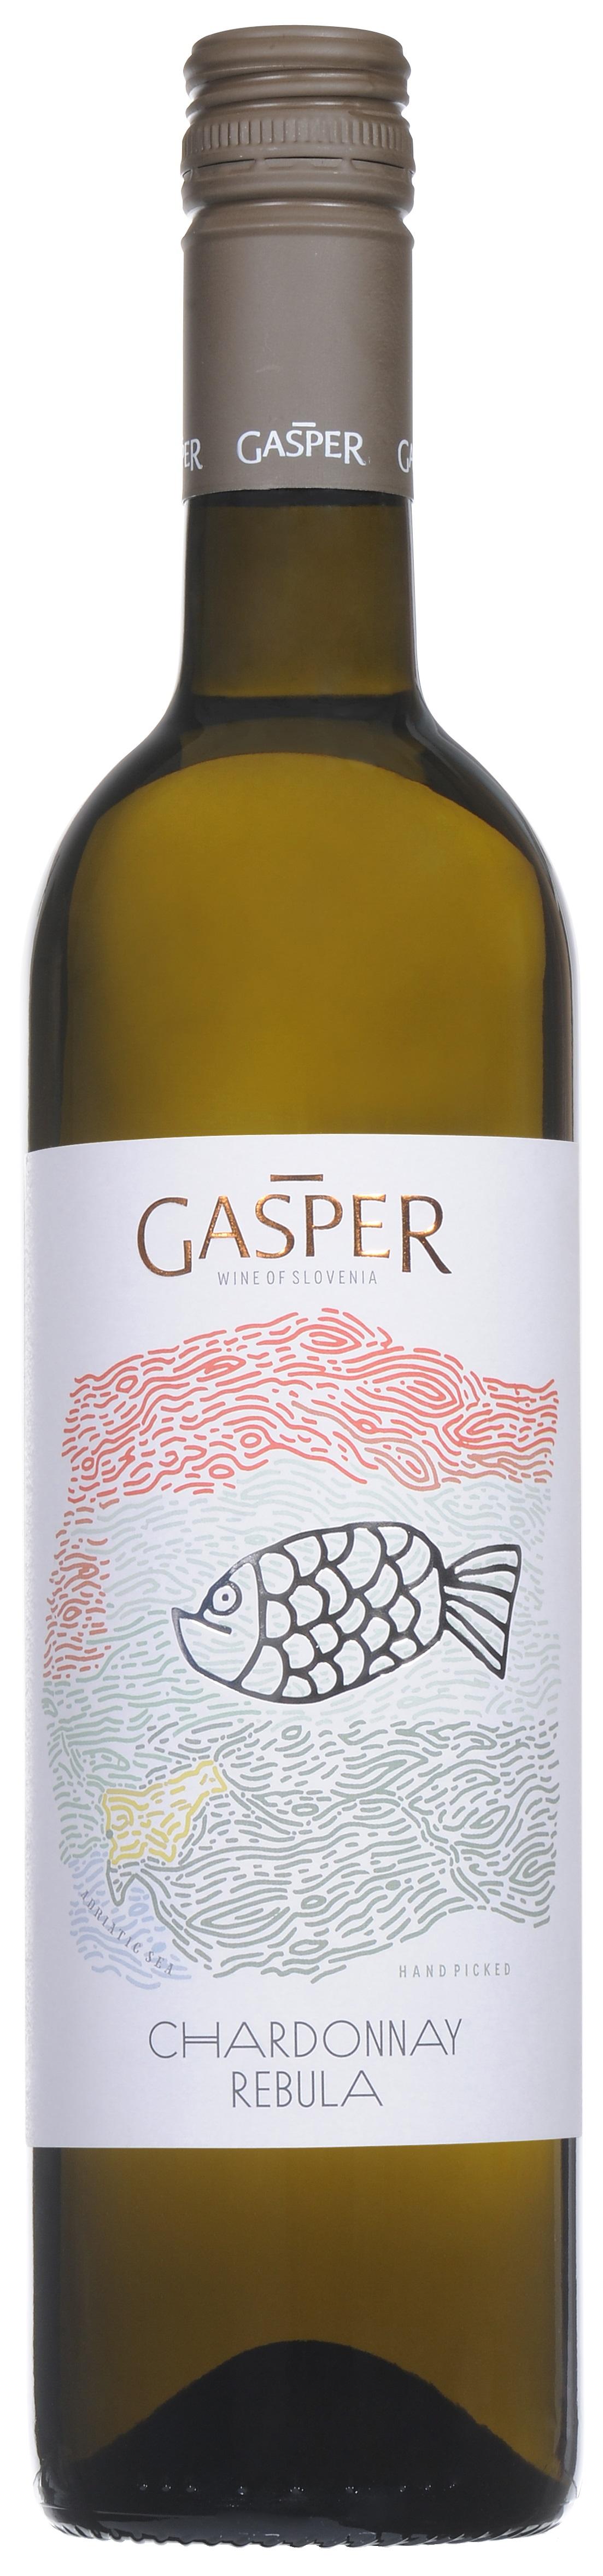 Gasper, Chardonnay/Rebula 2015